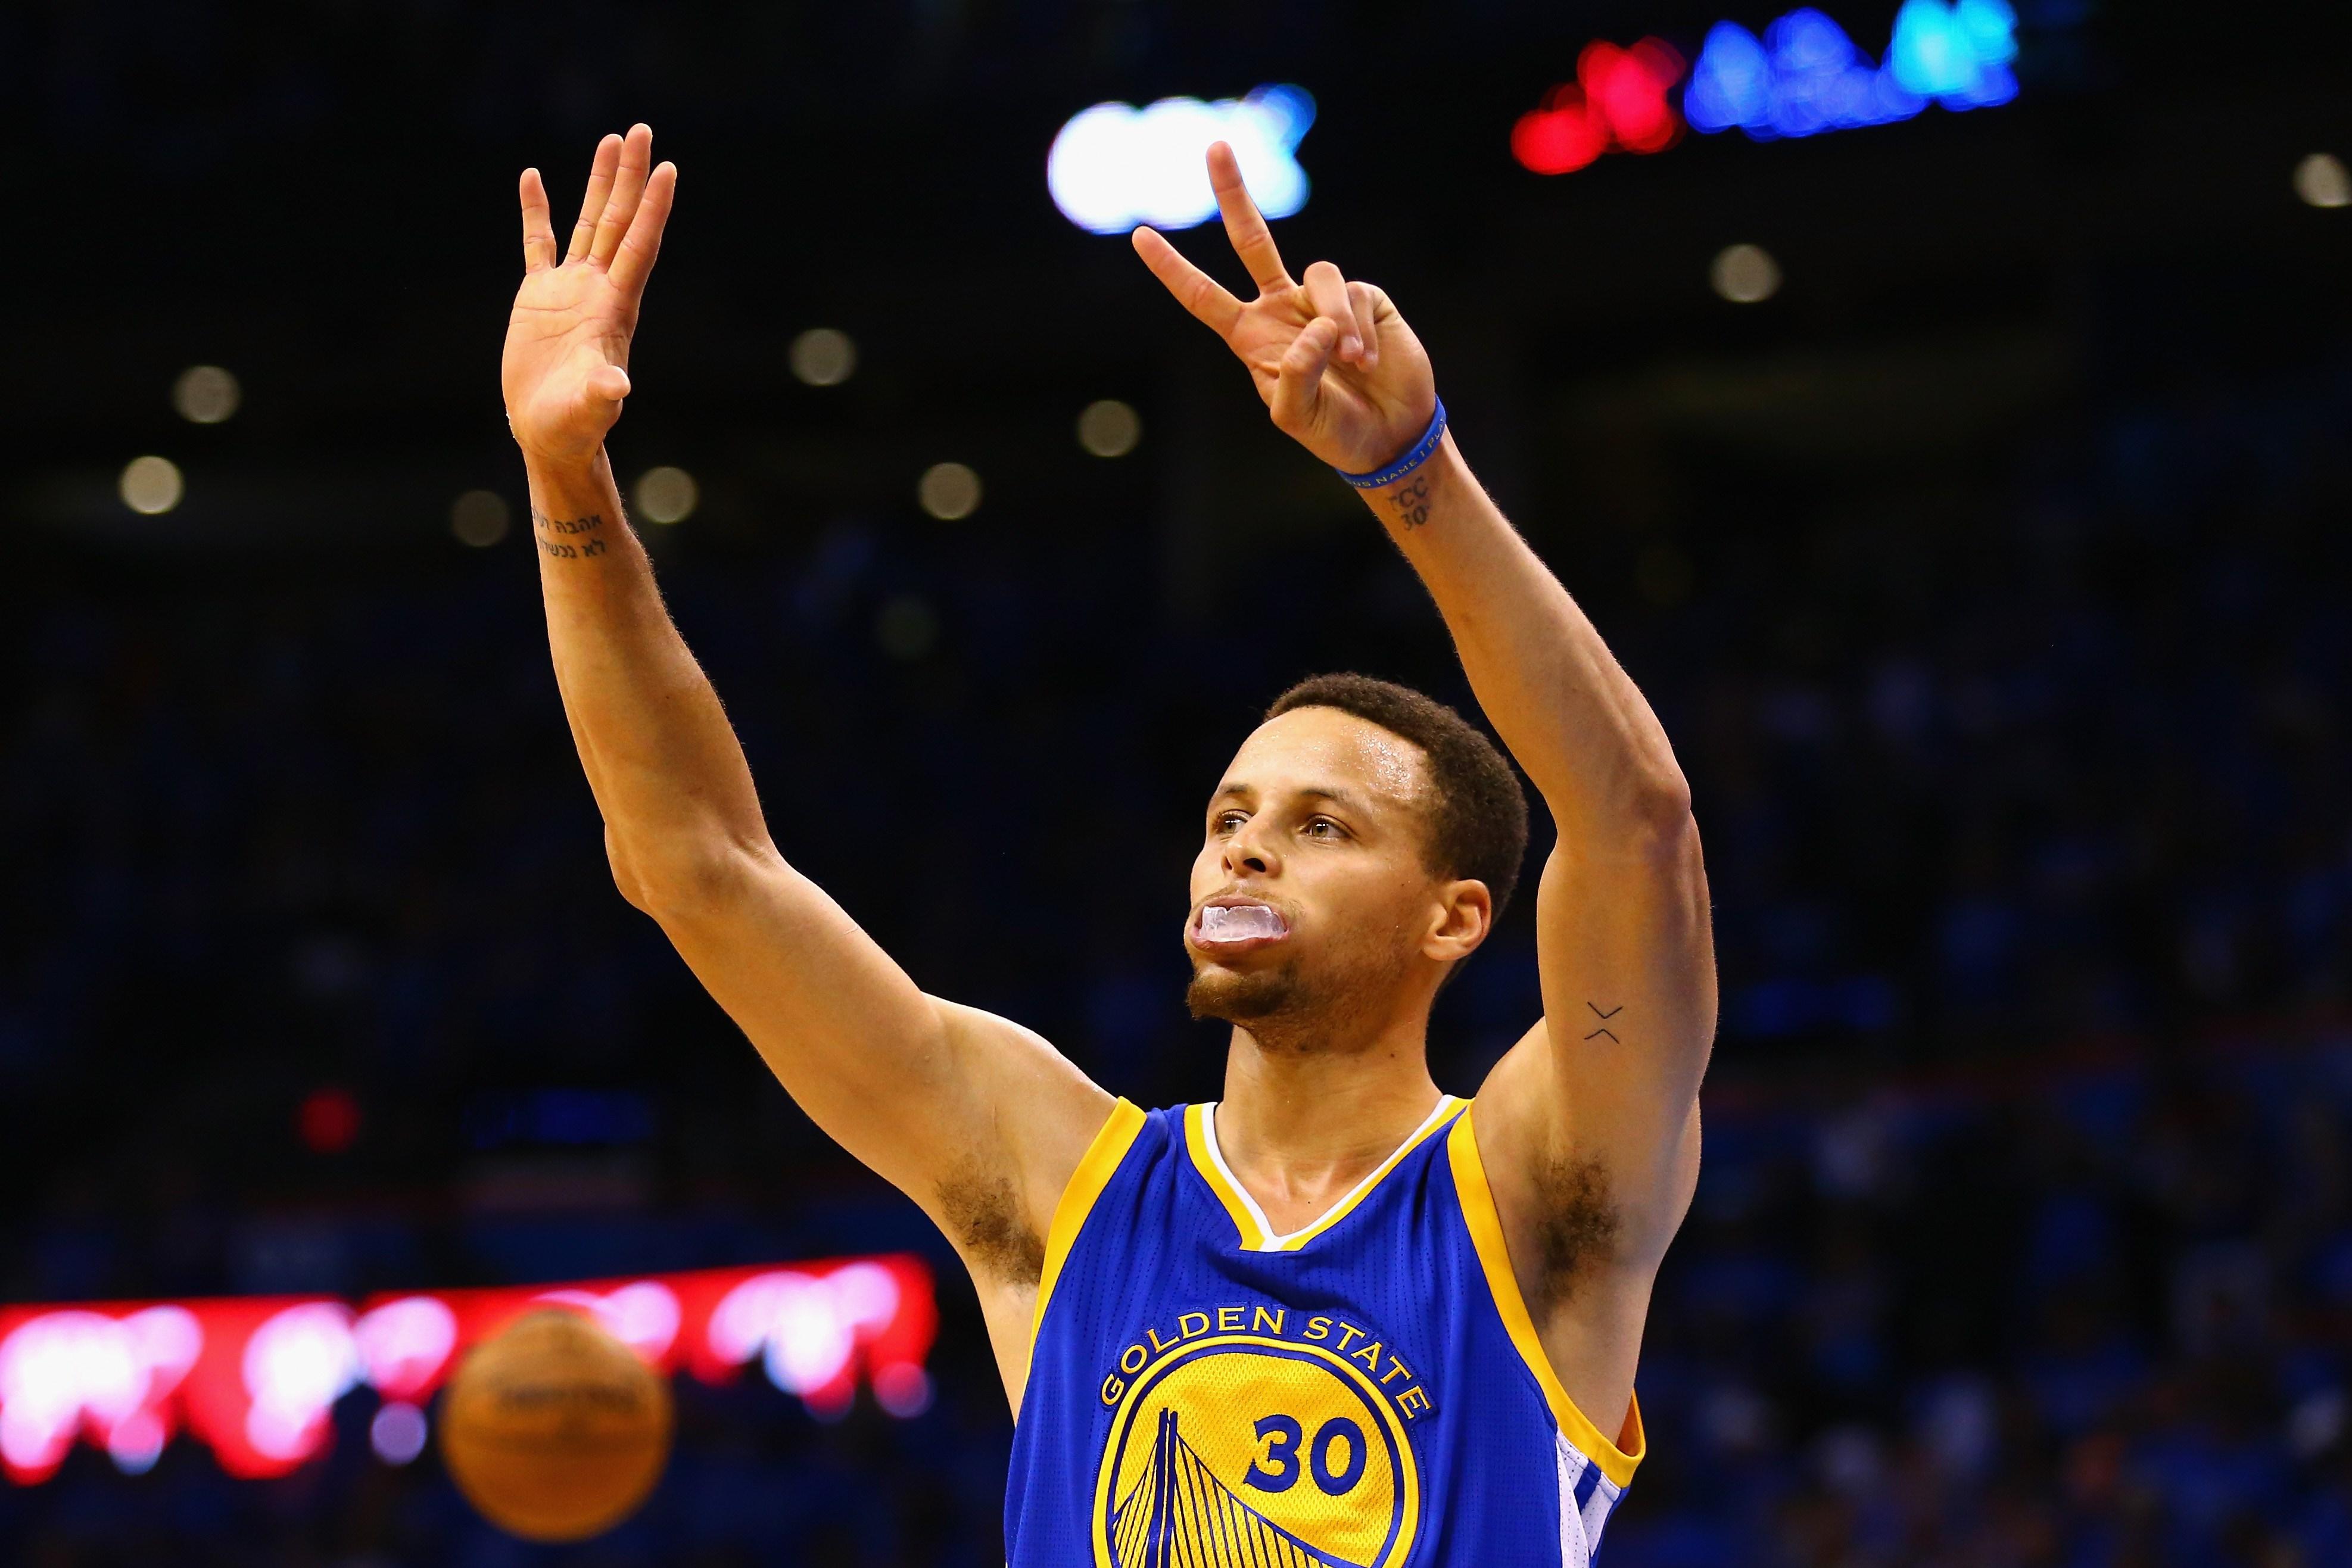 Basket - NBA - Golden State-Oklahoma City : 7 questions avant le match 7